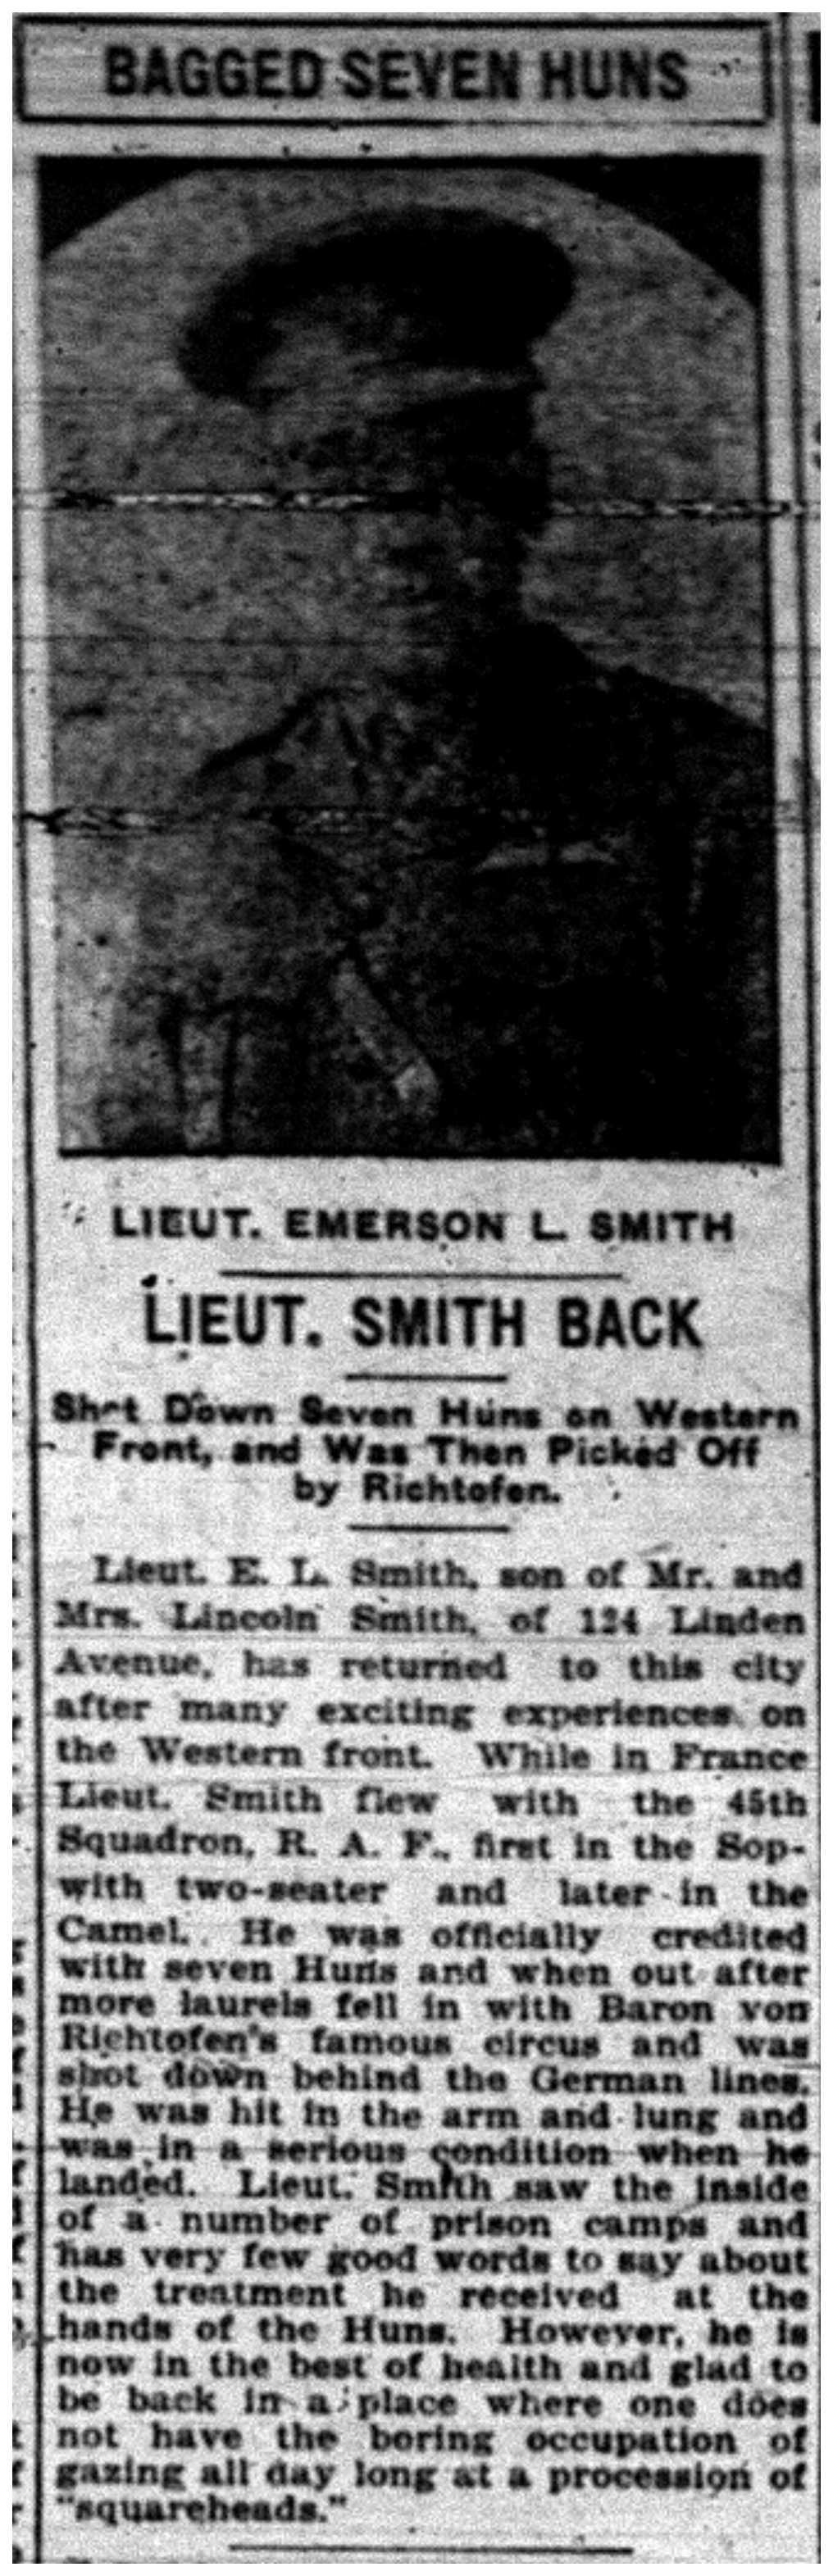 """Bagged Seven Huns: Lieut. Smith Back"""